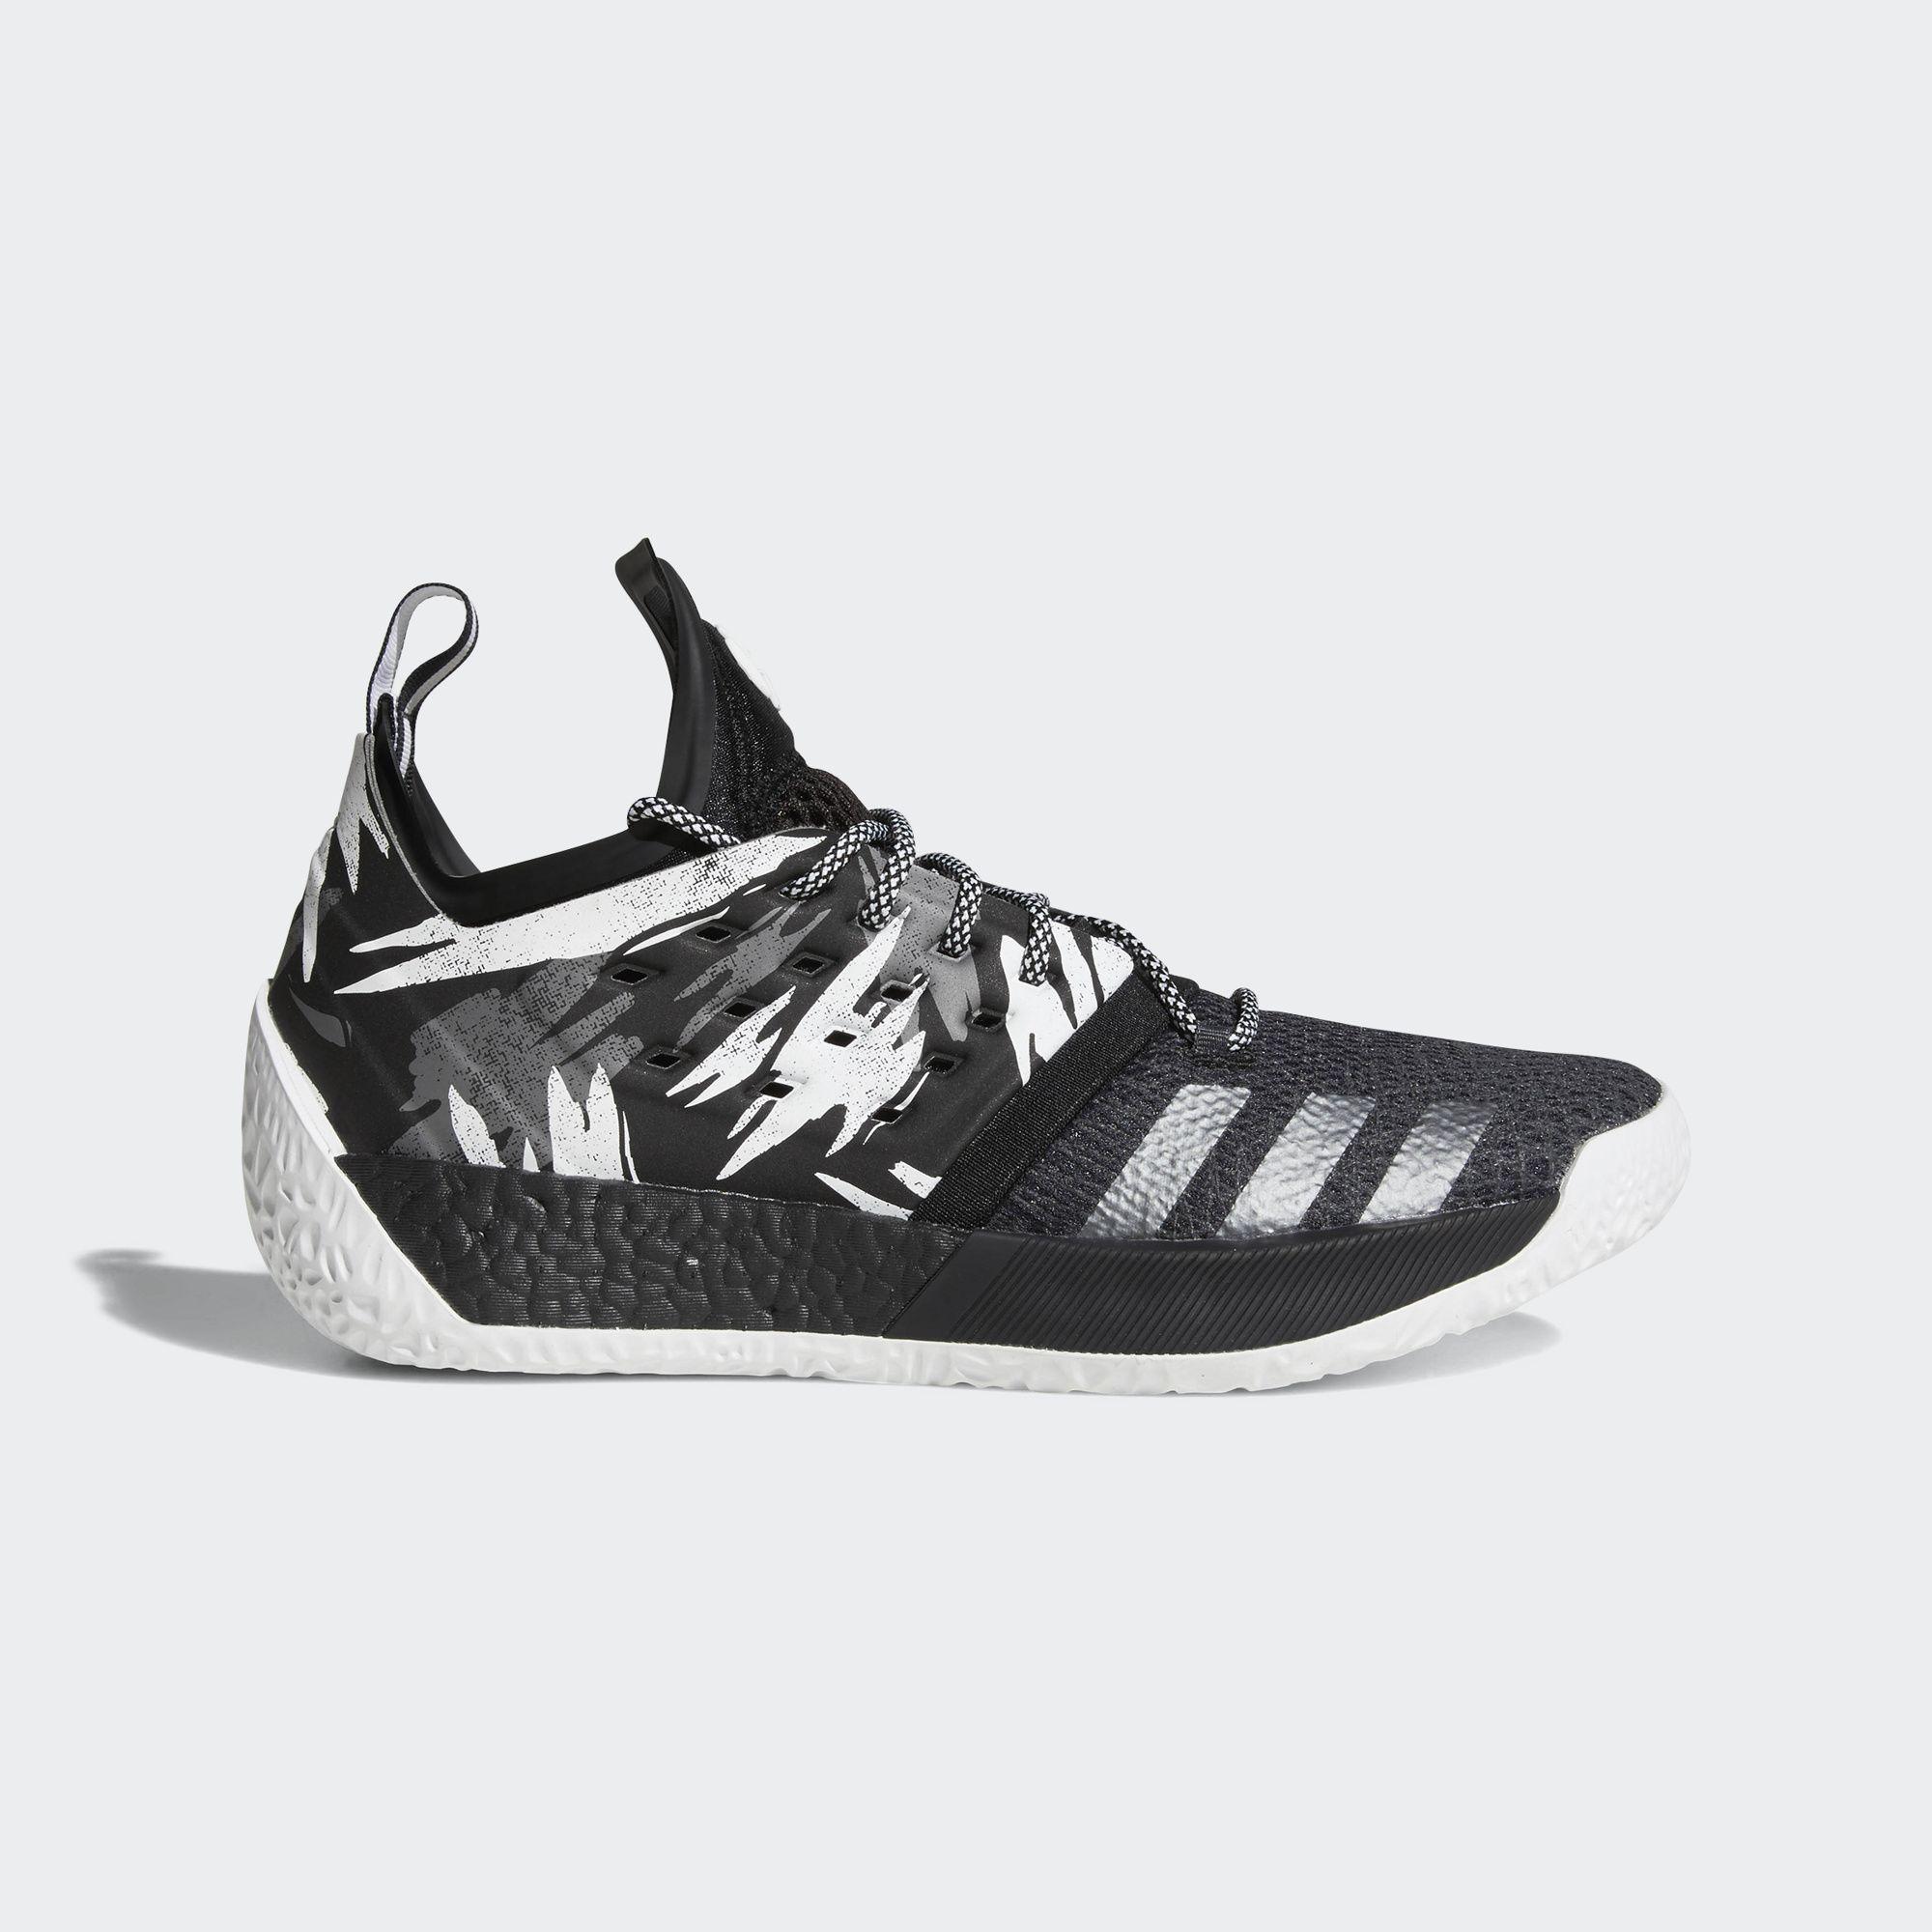 2407b27e5991 ... basketball shoes in core black footwear fc342 866a5  buy adidas harden  vol 2 black white 1 15528 4cff1